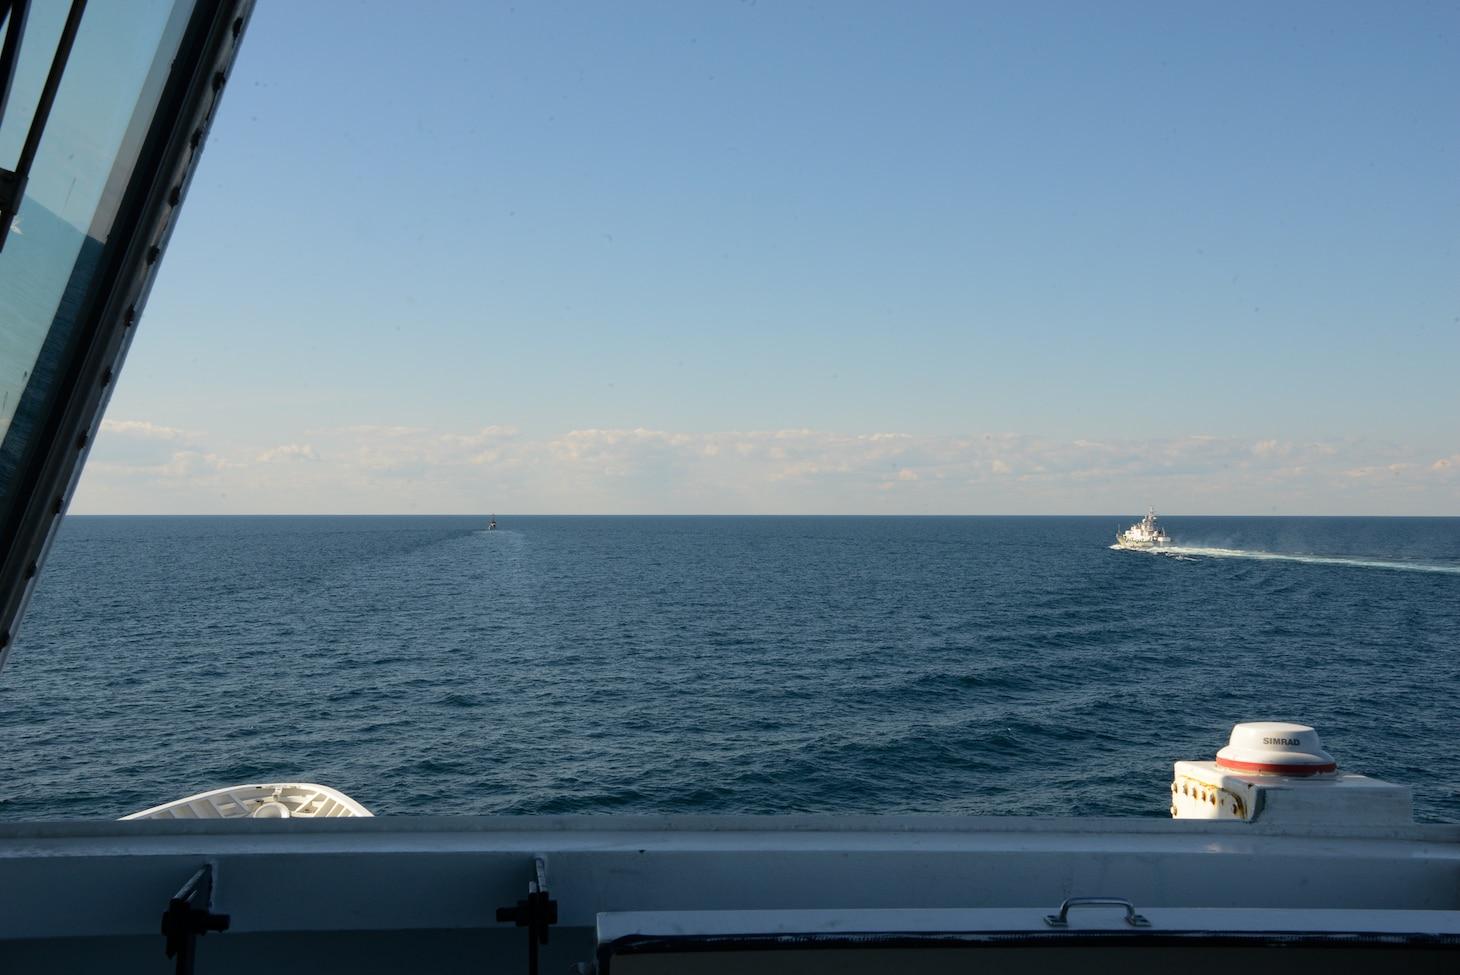 USCGC Hamilton (WMSL 753) and a Ukranian coast guard vessel conduct underway maneuvers in the Black Sea.